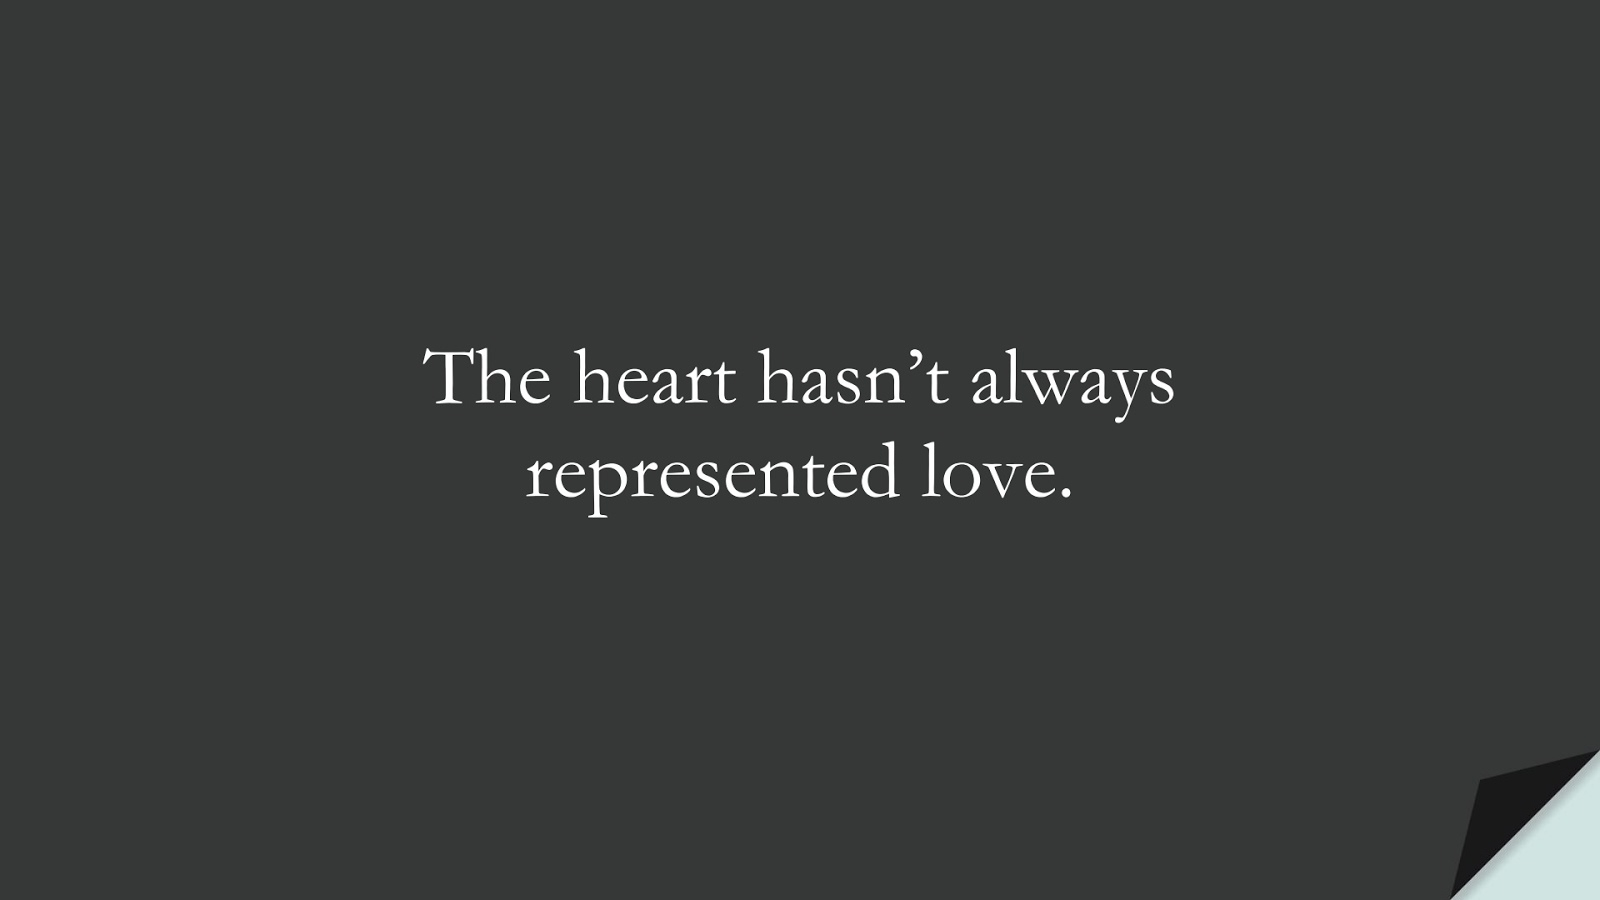 The heart hasn't always represented love.FALSE